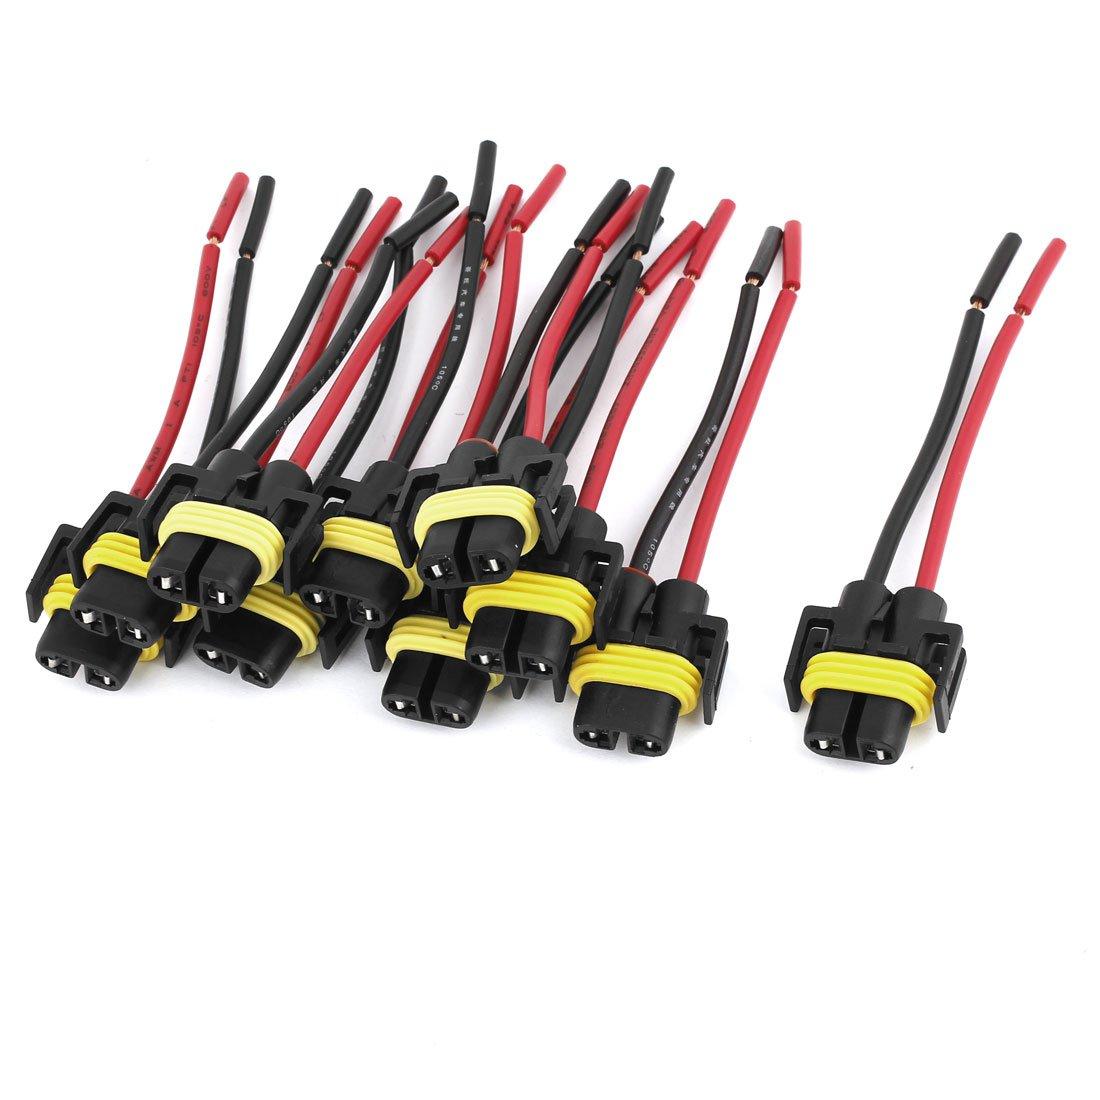 uxcell 10 Pcs Auto Headlight H11 Socket Harness Plastic Connector Base US-SA-AJD-39923